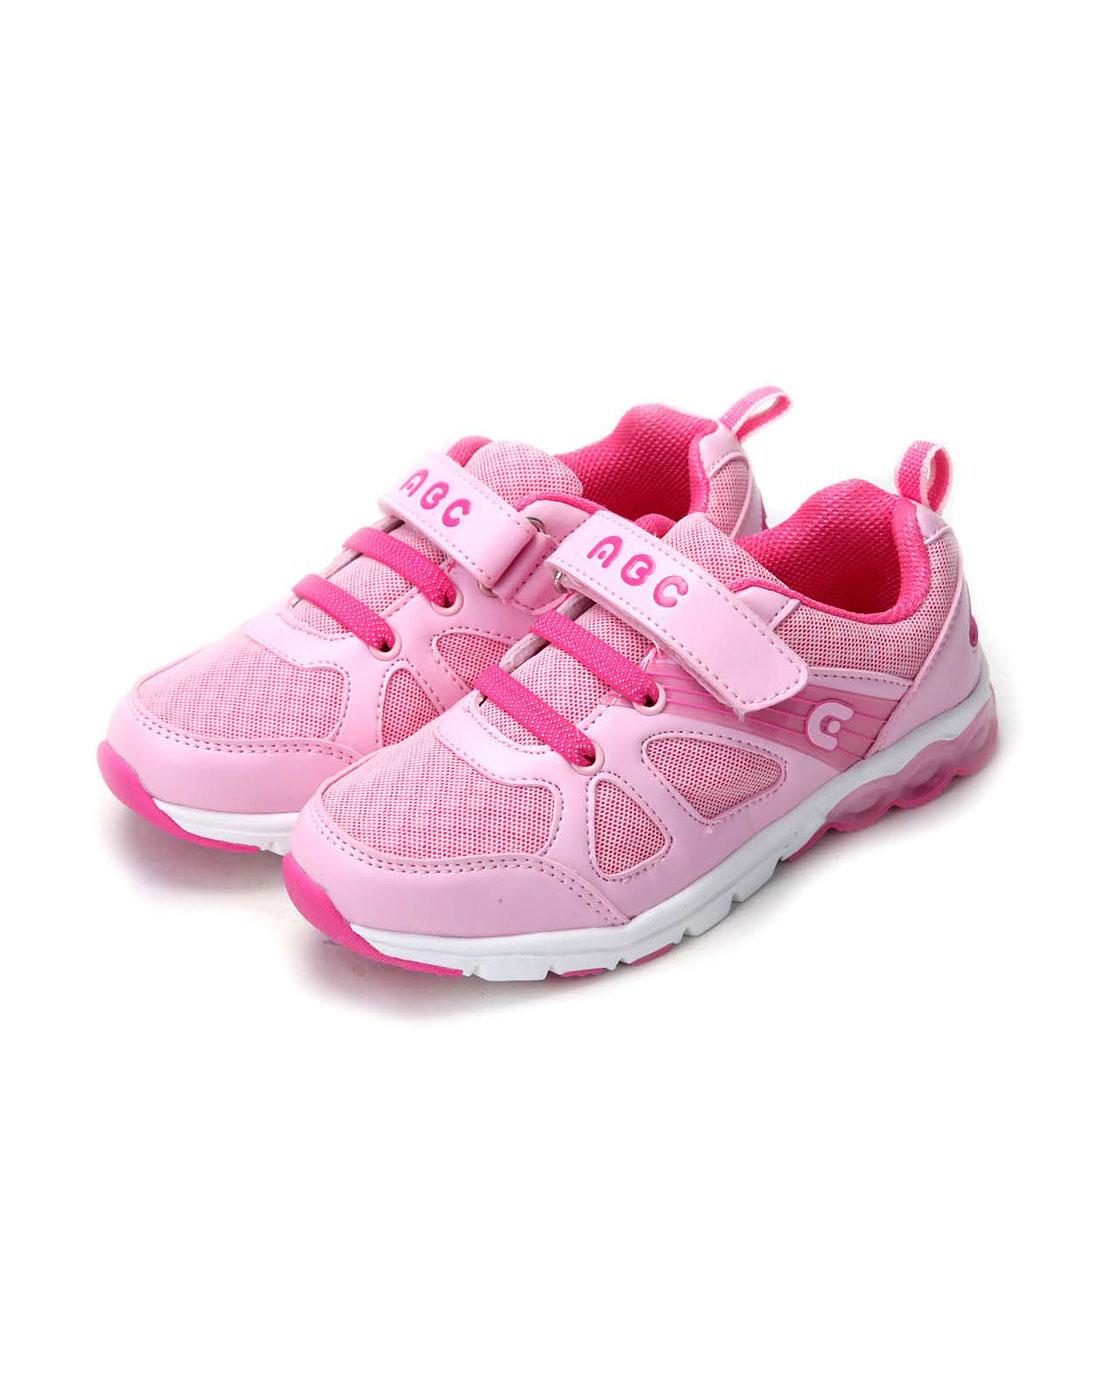 abckids男女童鞋女中童粉红玫红跑步运动鞋y2313513d